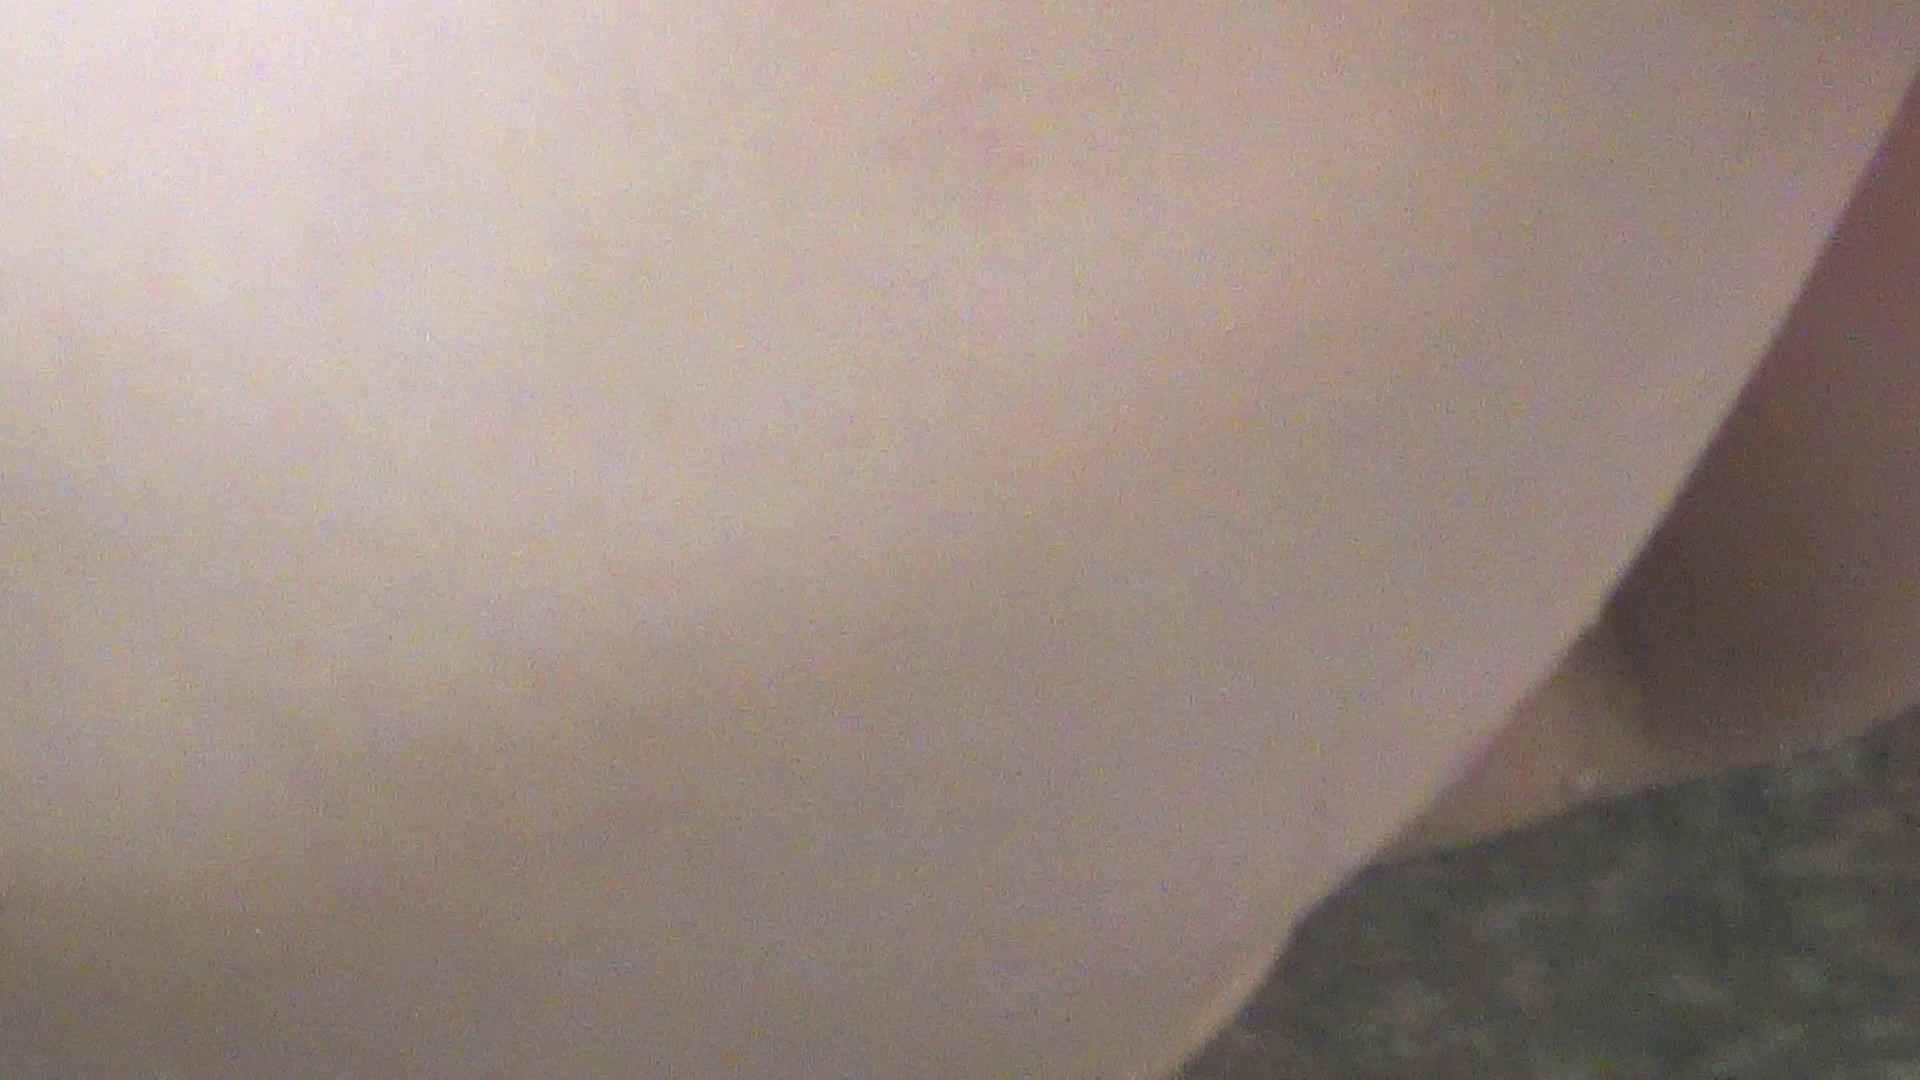 Vol.65 波平陰毛 体育座りで魅惑のチラリ チラ 覗きスケベ動画紹介 42pic 39